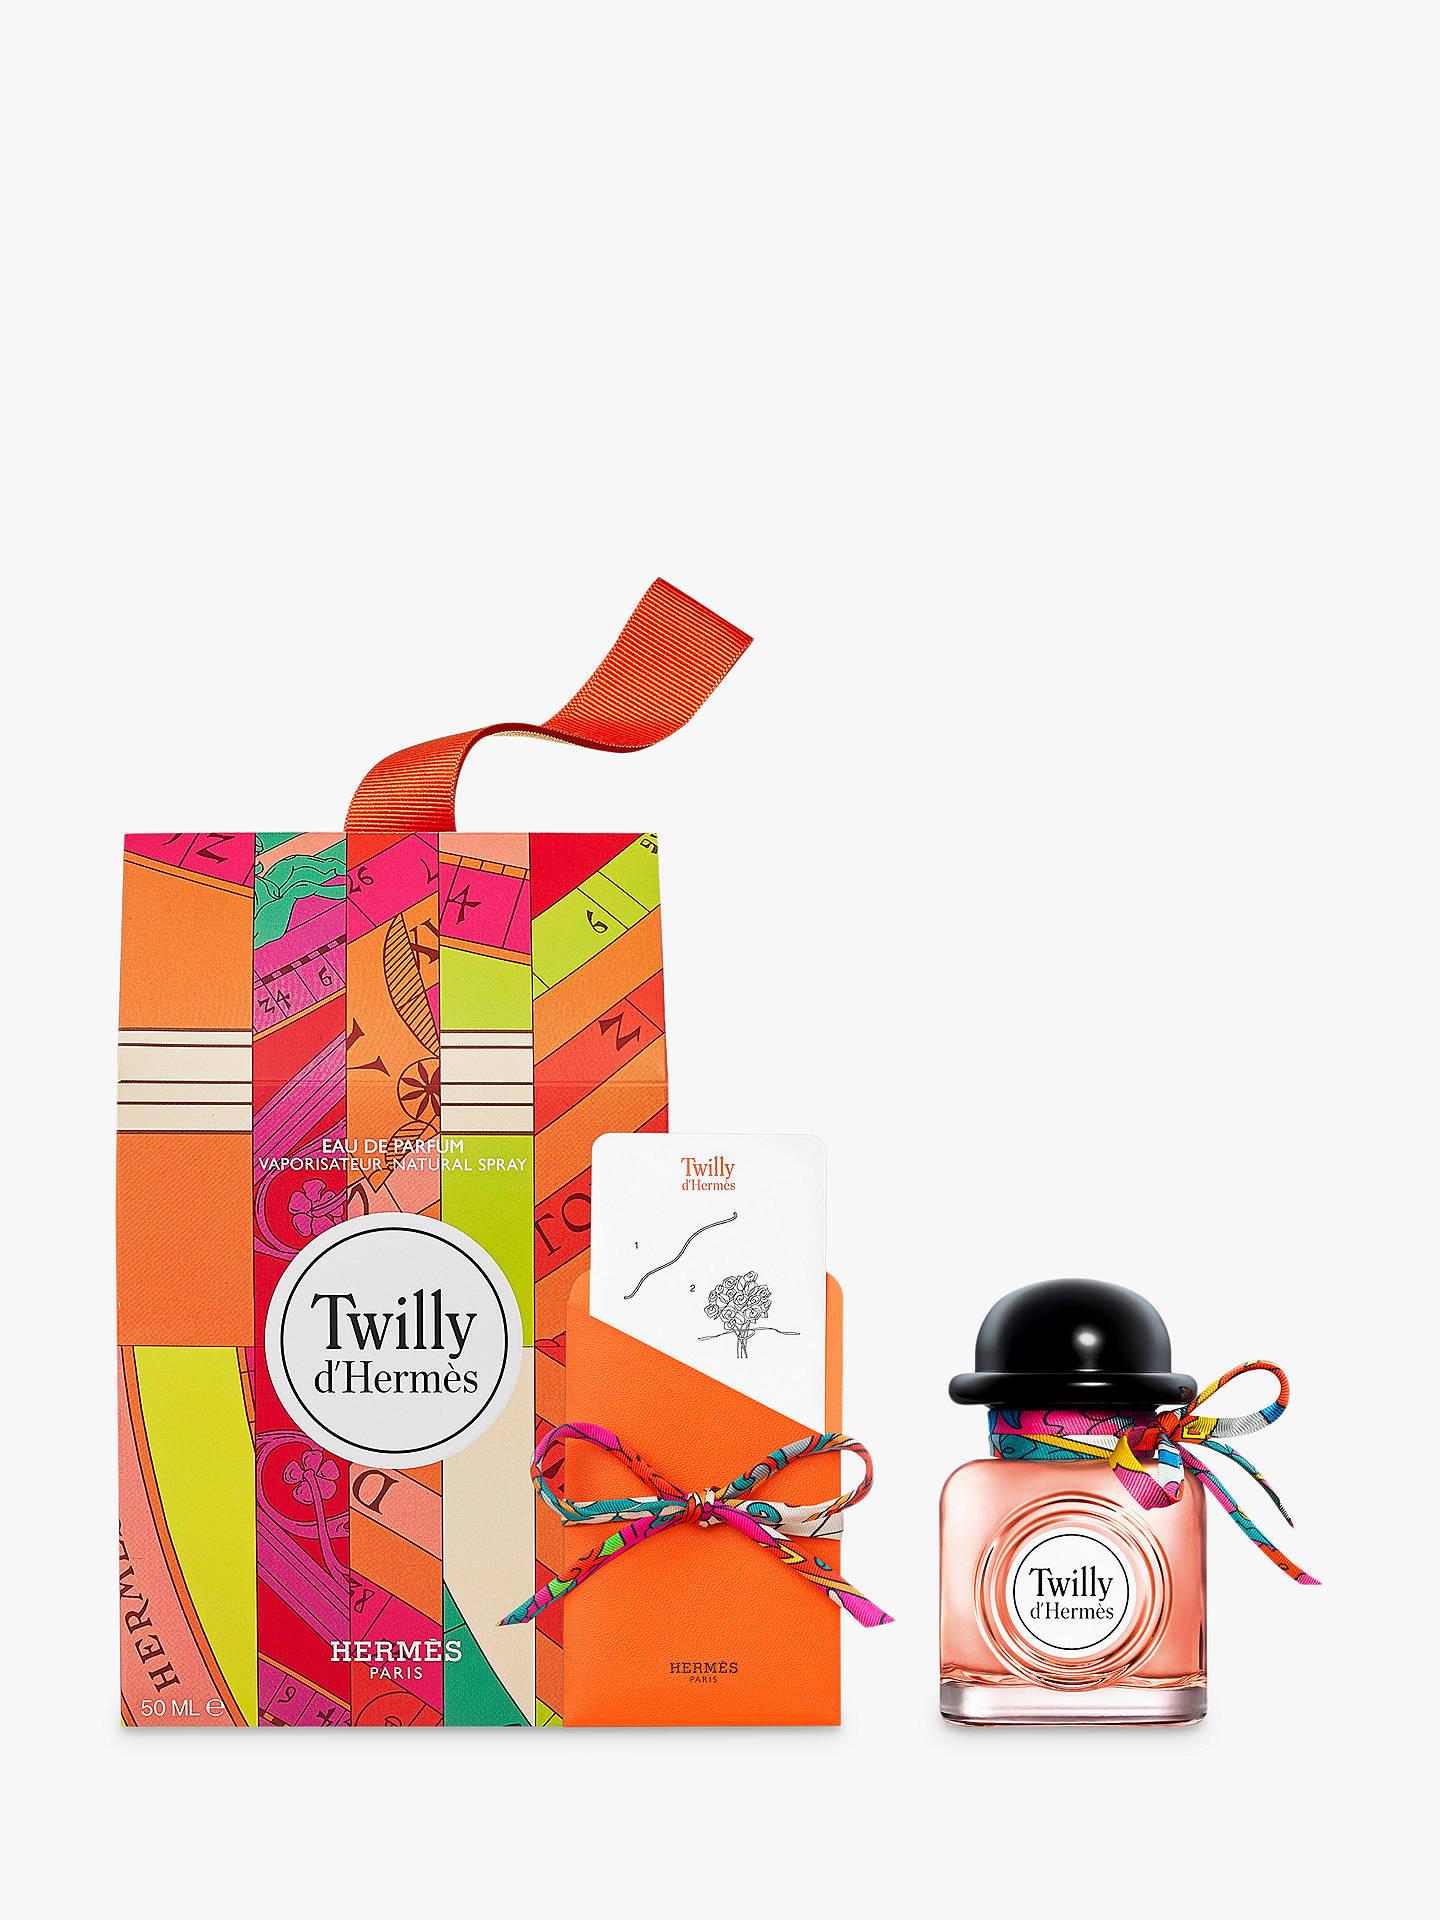 00ec724f3f8a Buy HERMÈS Twilly d'Hermès 50ml Eau de Parfum Fragrance Gift Set Online at  johnlewis